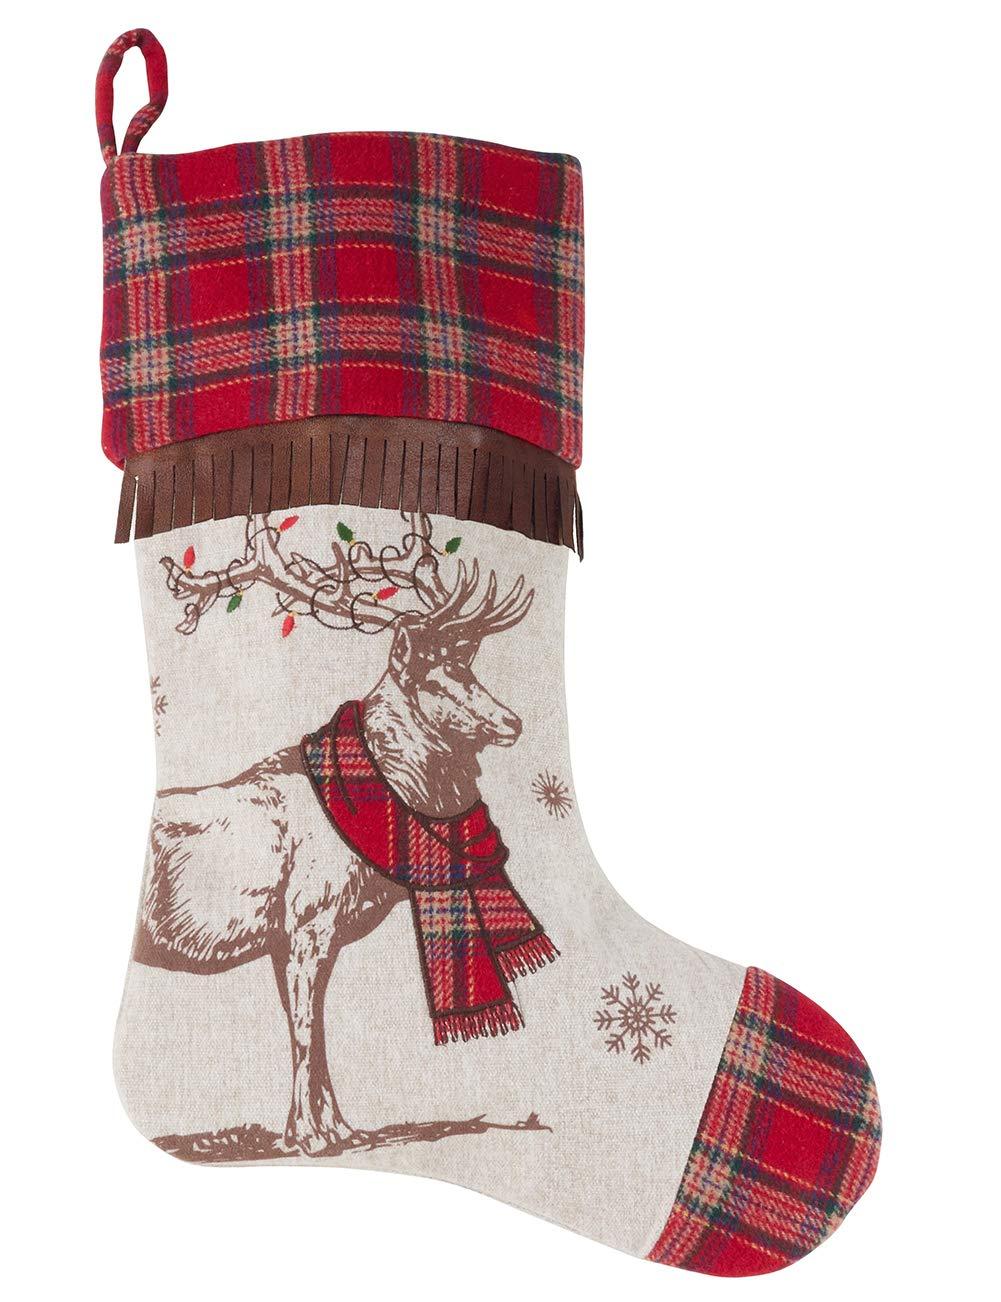 Fennco Styles Classic Holiday Reindeer Christmas Stocking Holder with Fringe, 16''x20''